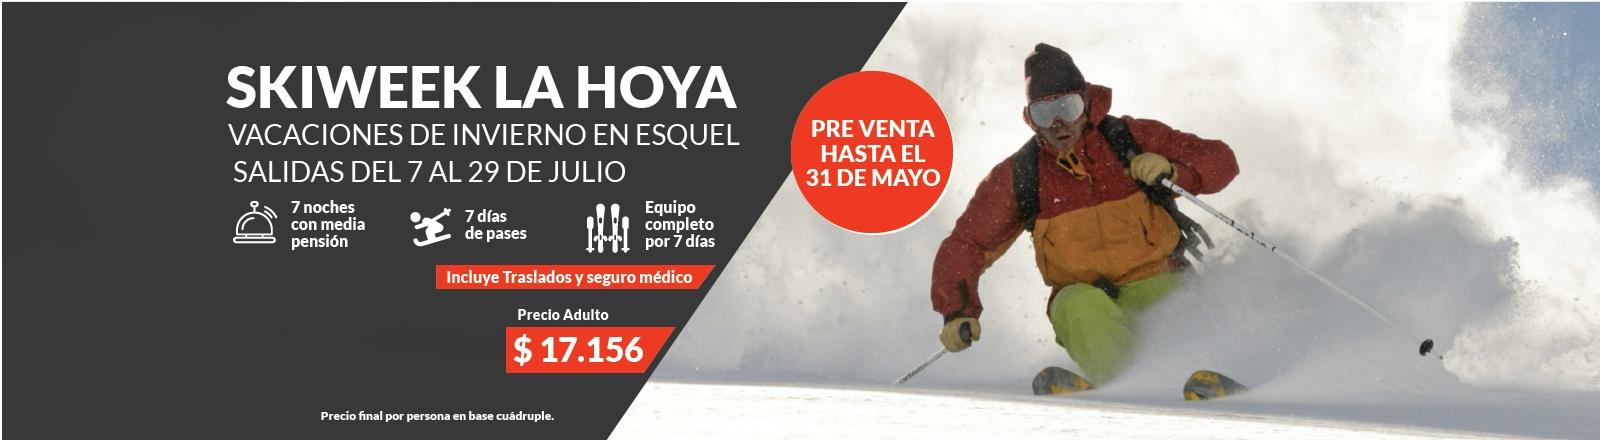 Skiweek en La Hoya - Esquel